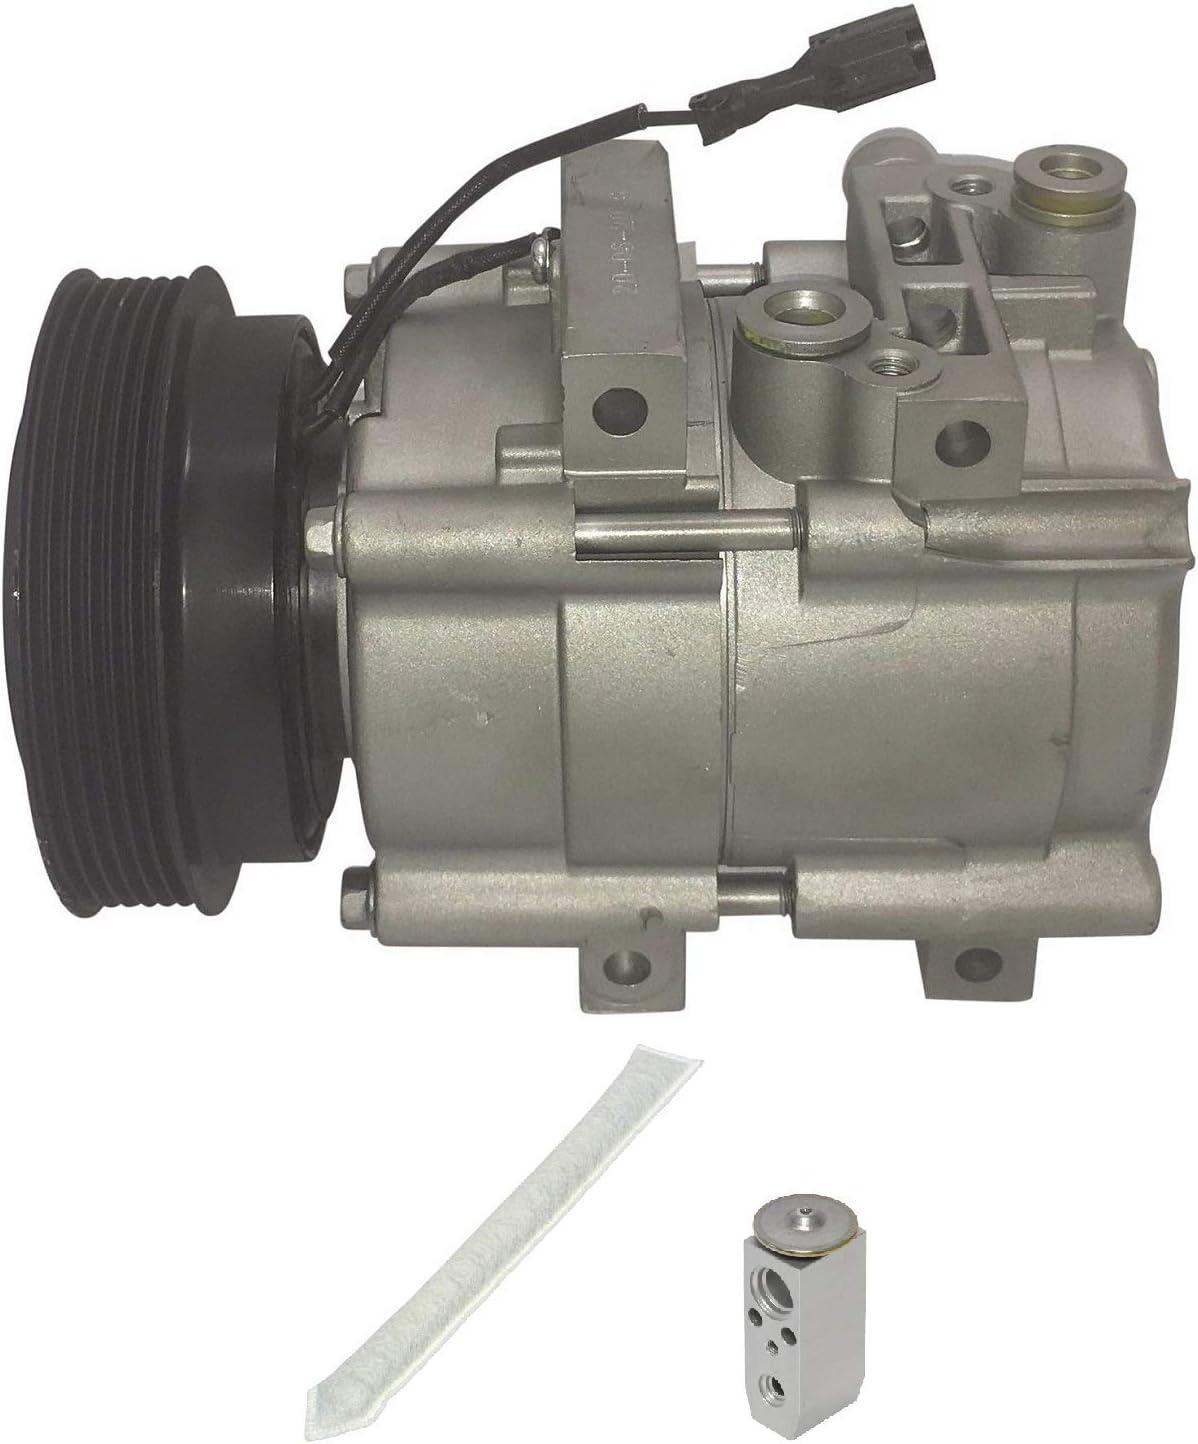 RYC Remanufactured AC Compressor Kit KT E008